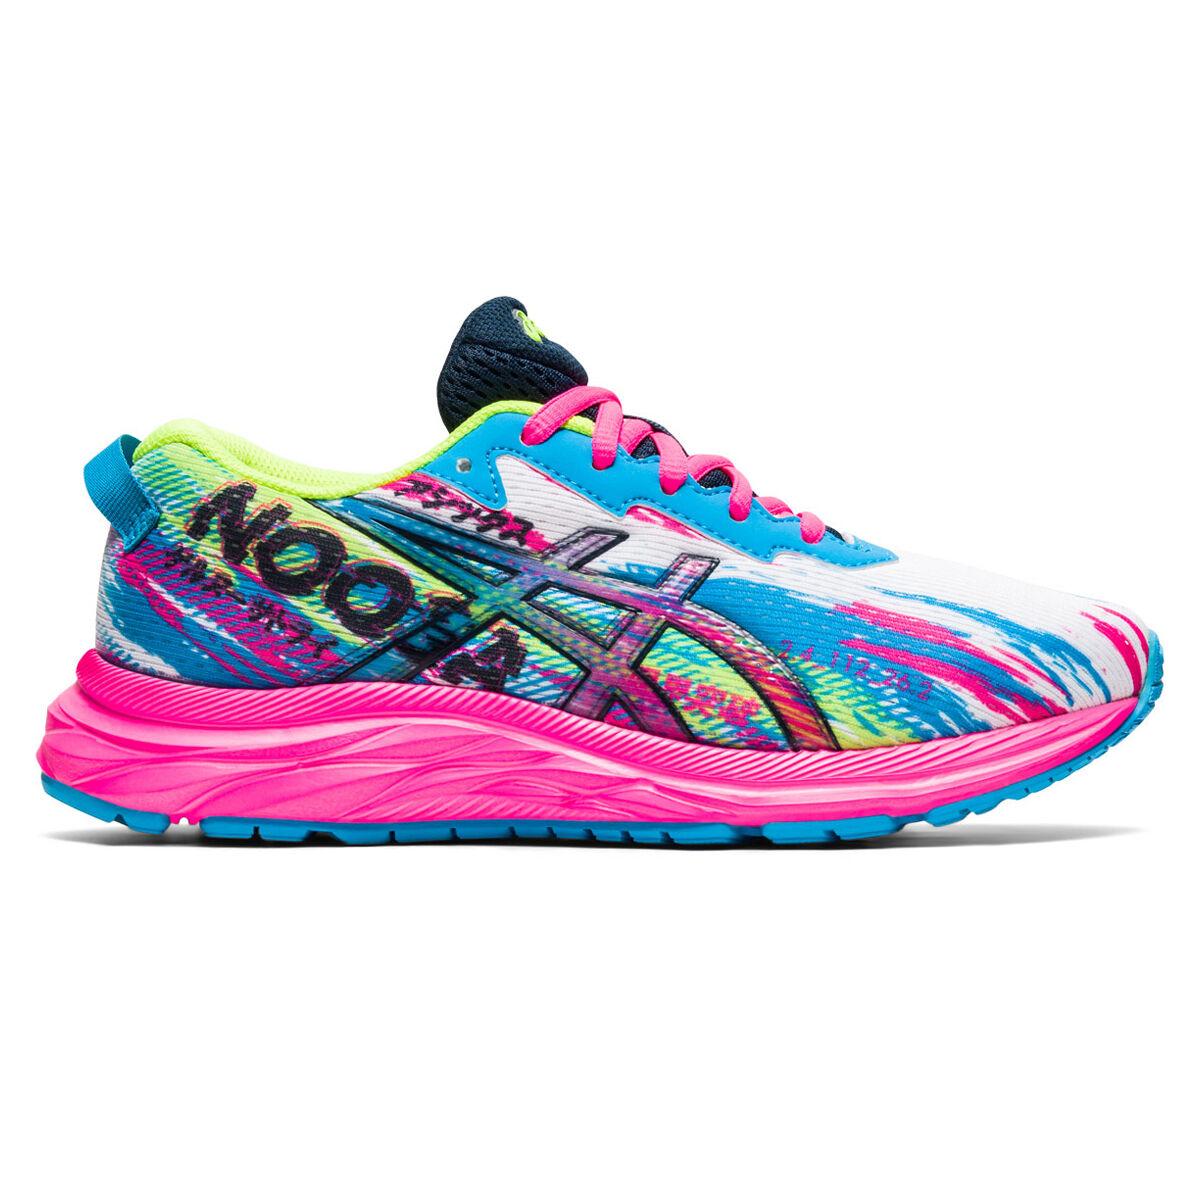 adidas gazelle liverpool | Asics GEL Noosa Tri 13 Kids Running Shoes